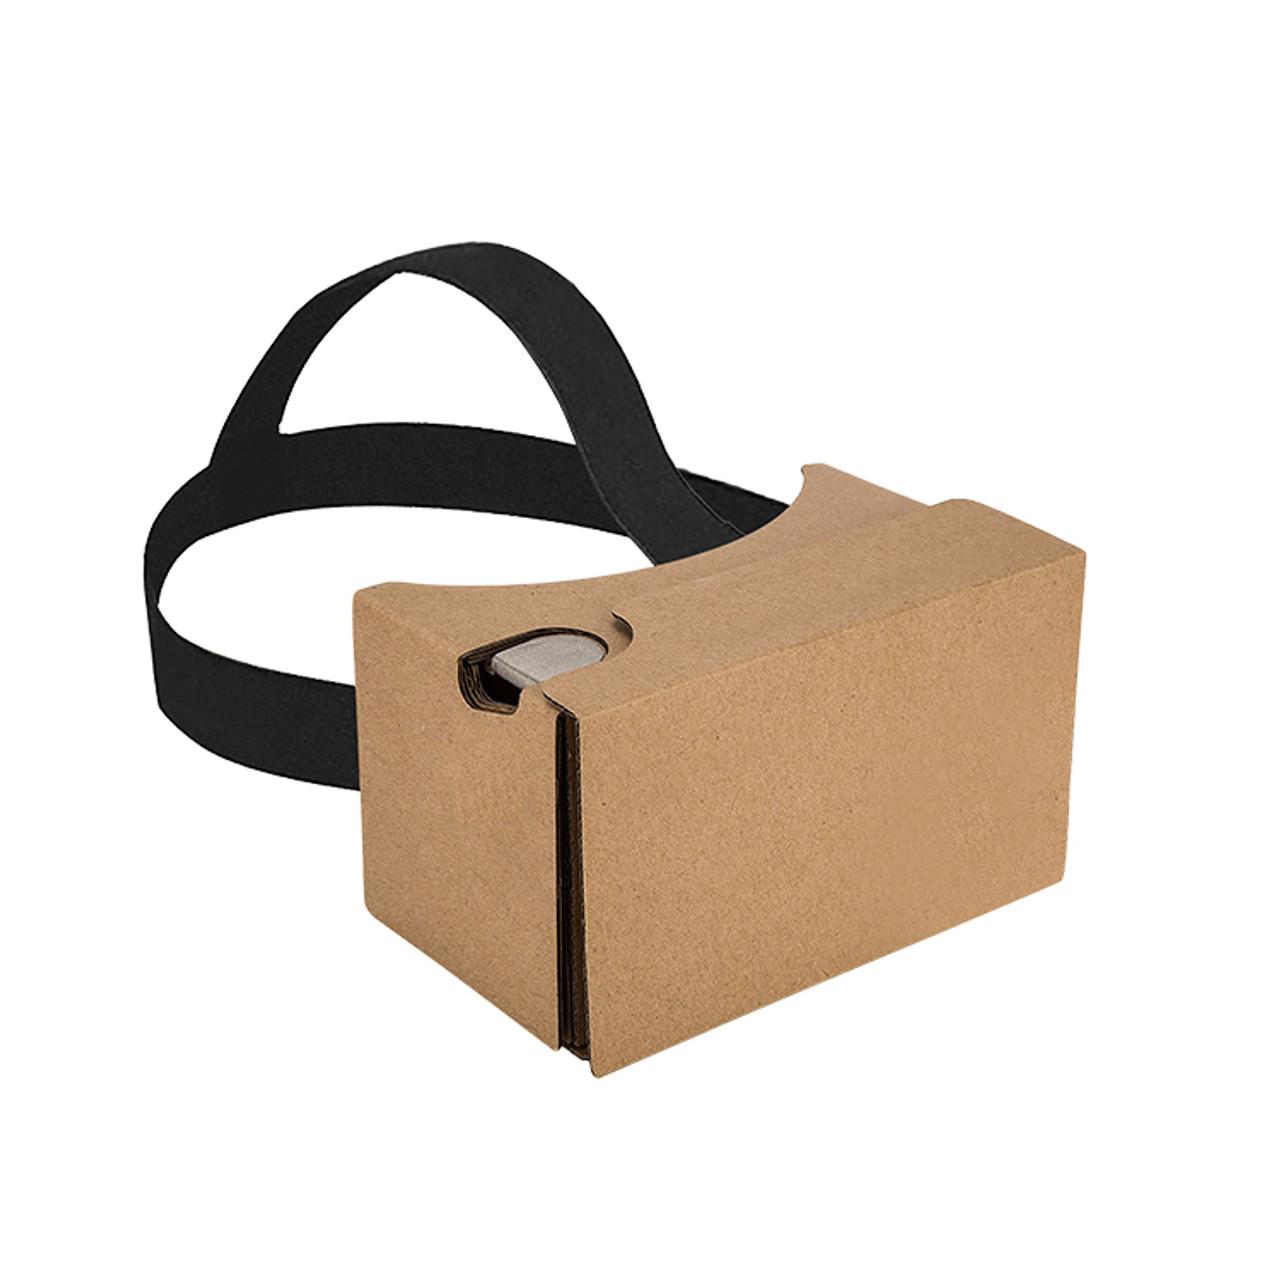 Bwt1323 Diy 3d Cardboard Vr Headset Ii